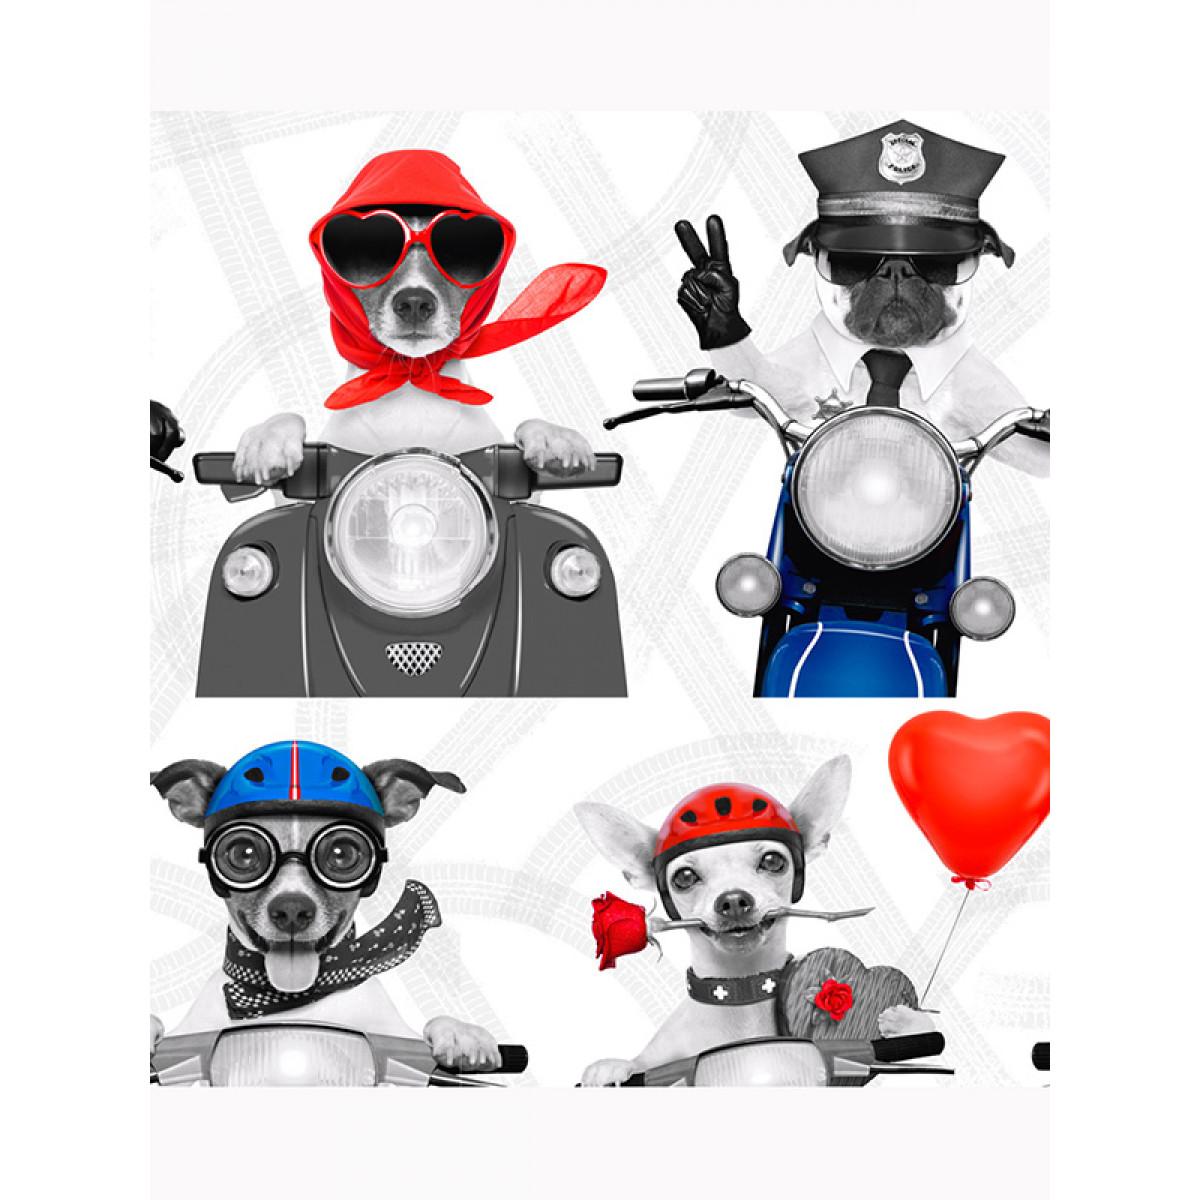 Newcastle United Bedroom Wallpaper Biker Dogs Wallpaper 102561 Muriva Feature Puppy